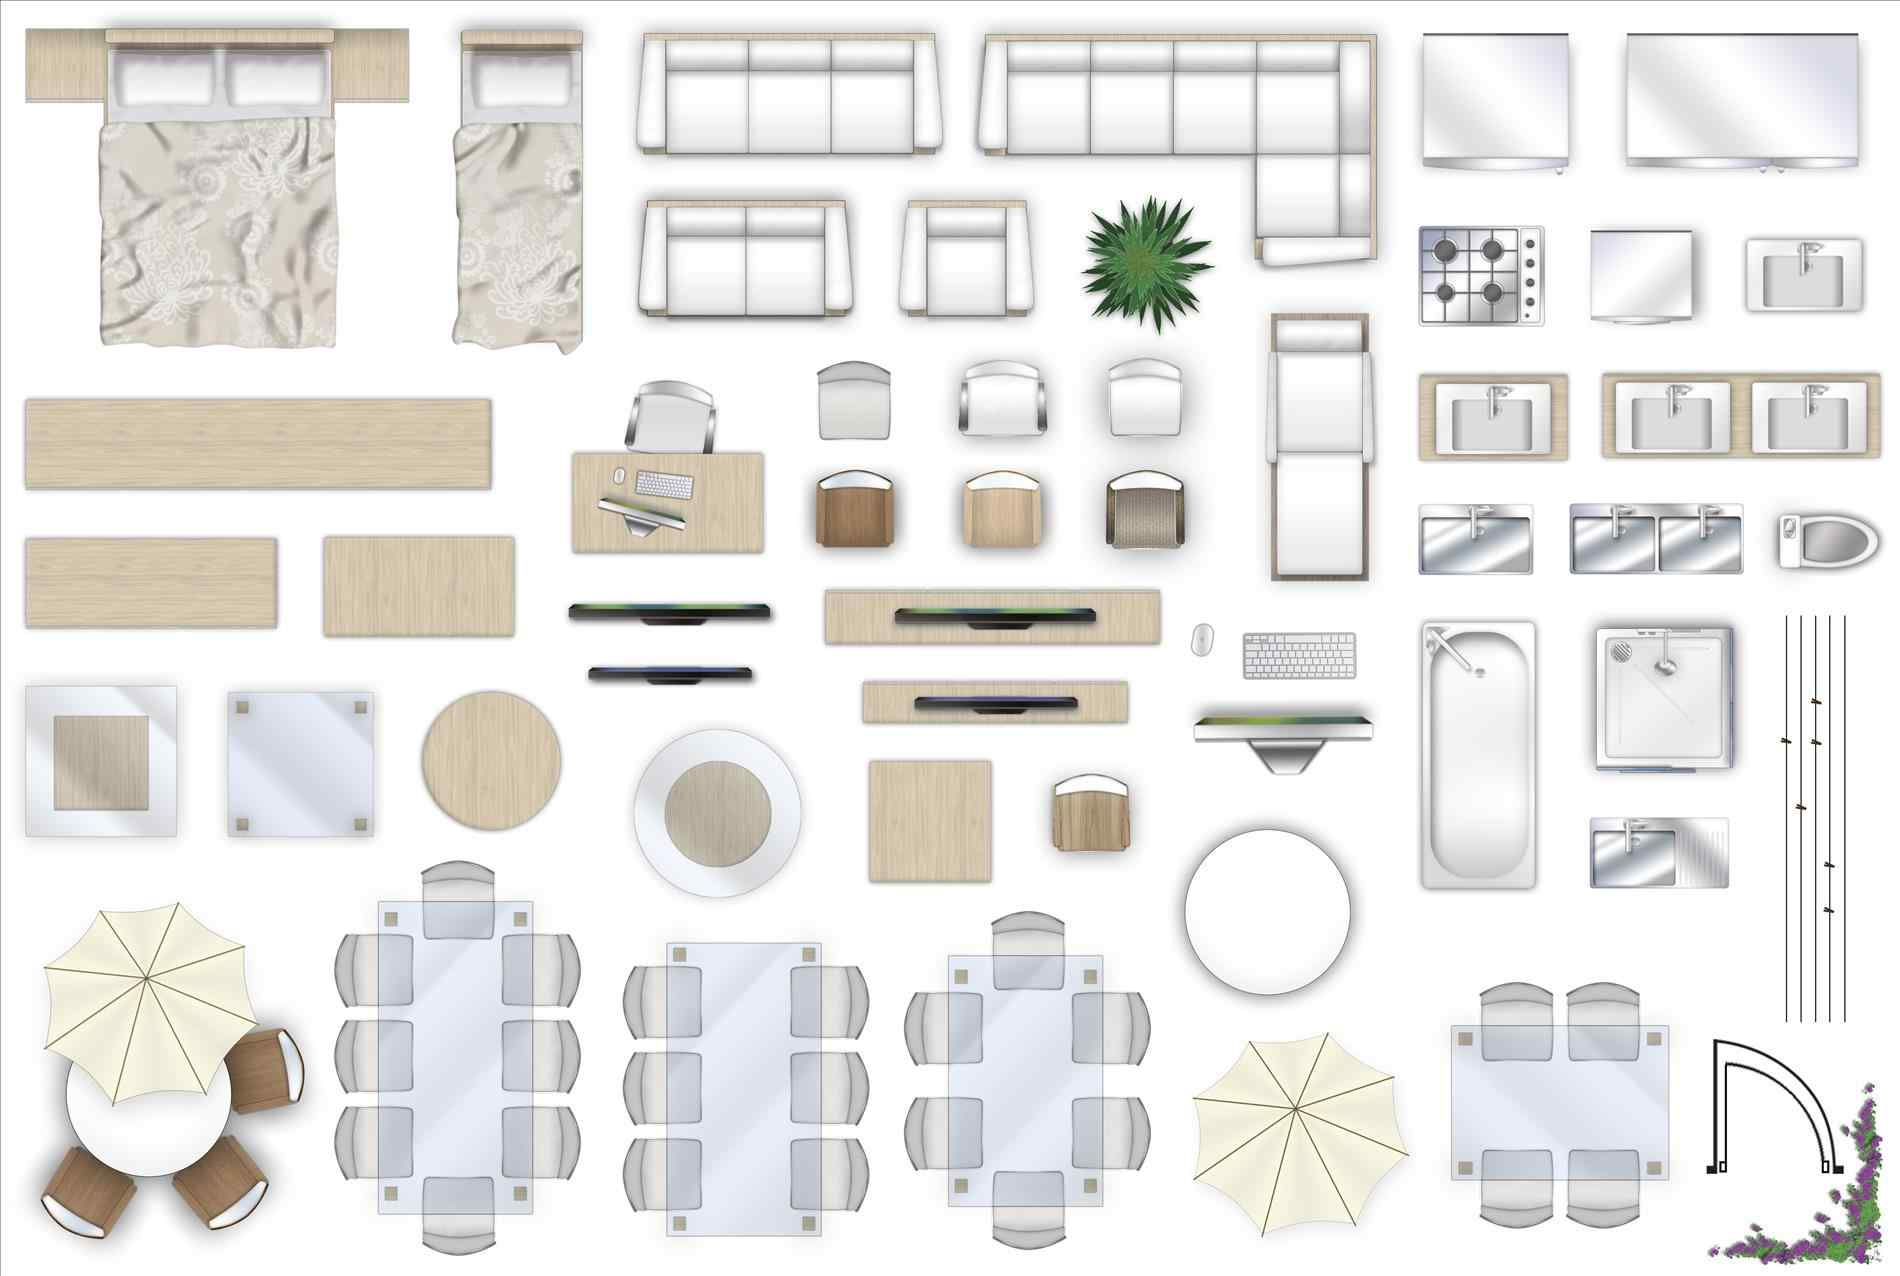 Floor Plan Furniture Clipart.